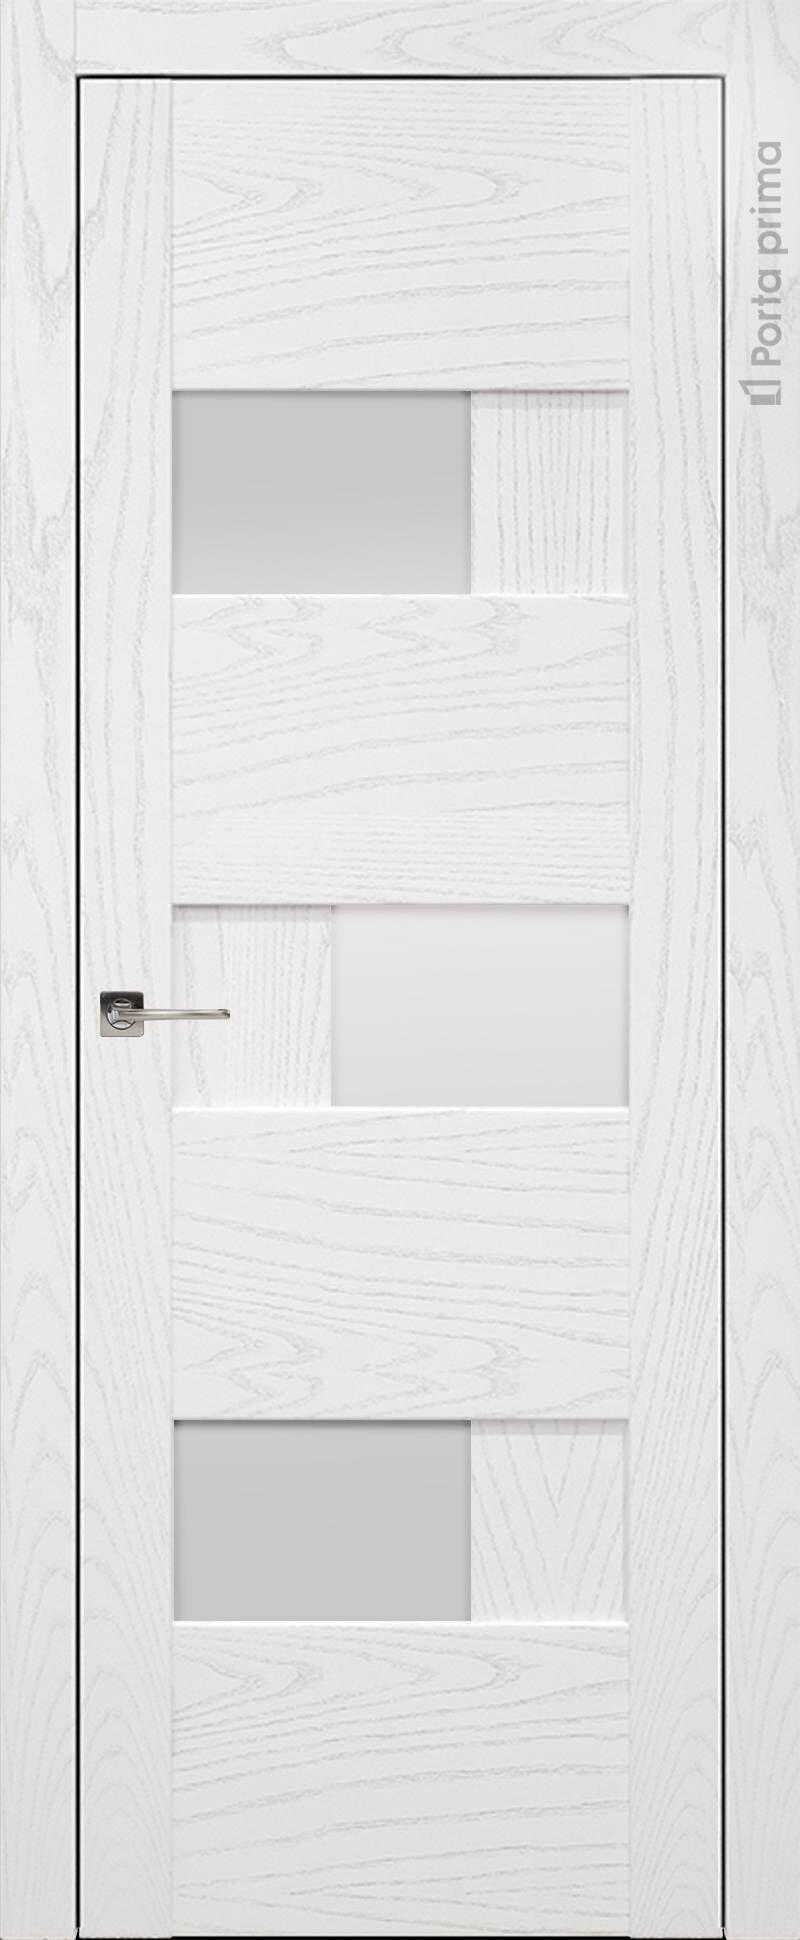 Vicenza цвет - Белый ясень (шпон) Со стеклом (ДО)